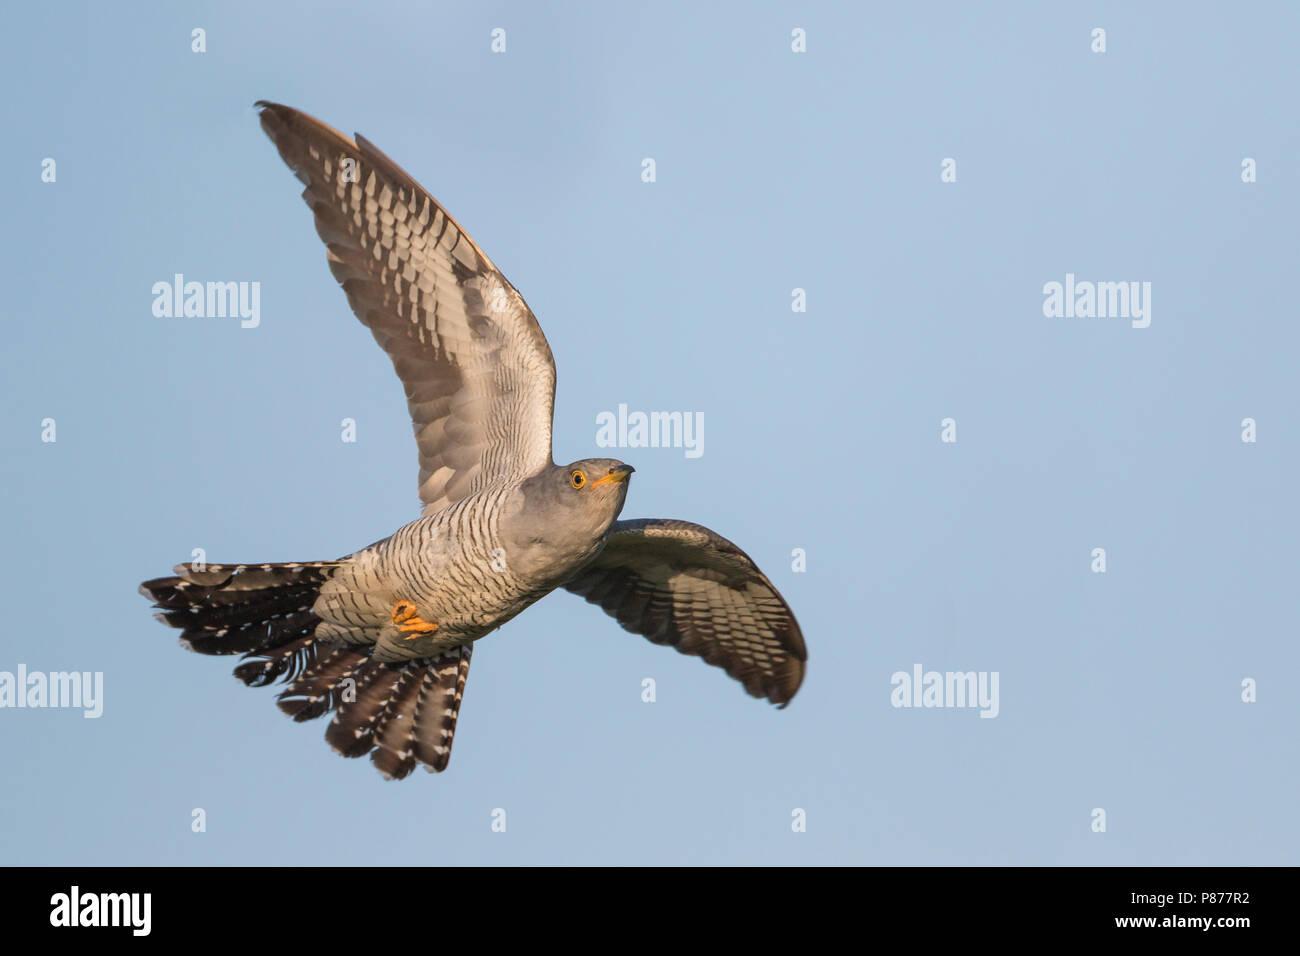 Cuckoo - Kuckuck - Cuculus canorus ssp. canorus, Russia, adult, male - Stock Image